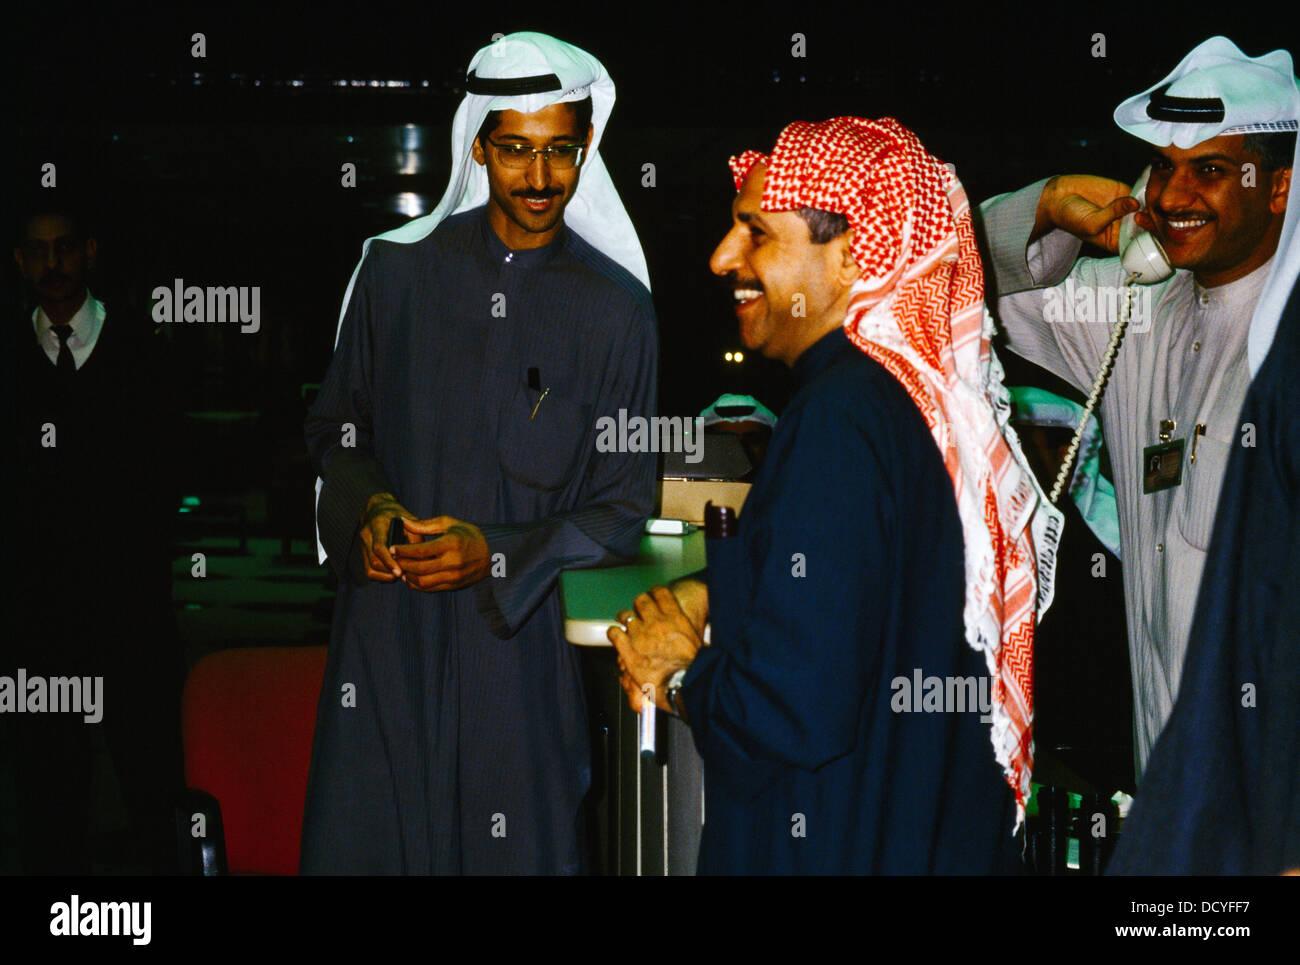 Kuwait City Kuwait Stock Exchange Dealers - Stock Image